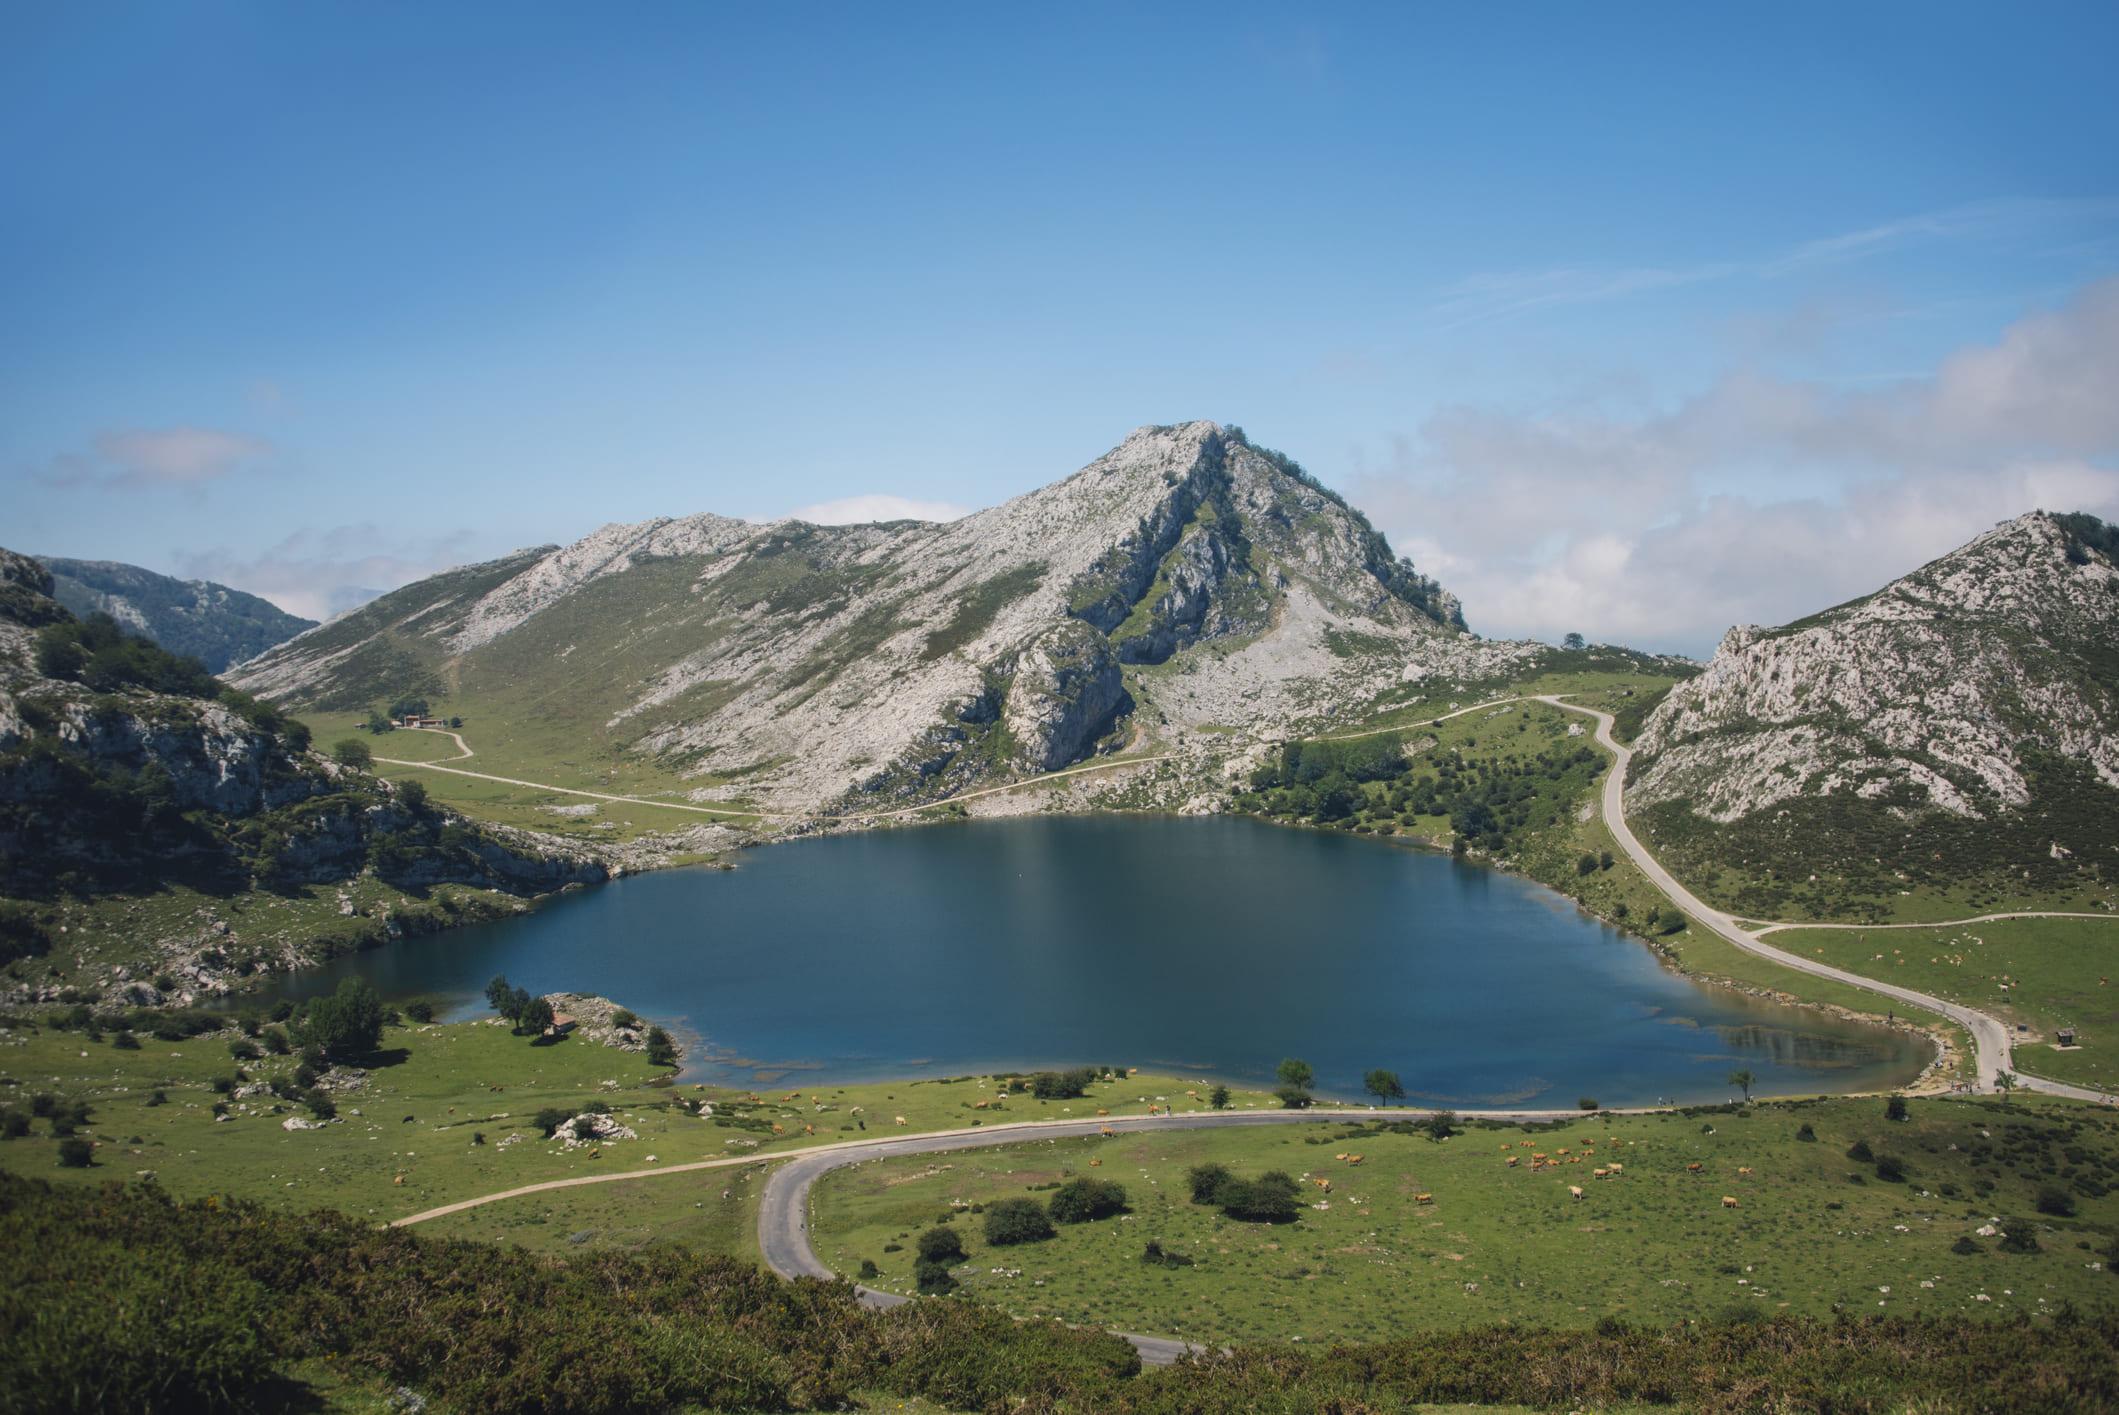 Escápate el fin de semana a Picos de Europa